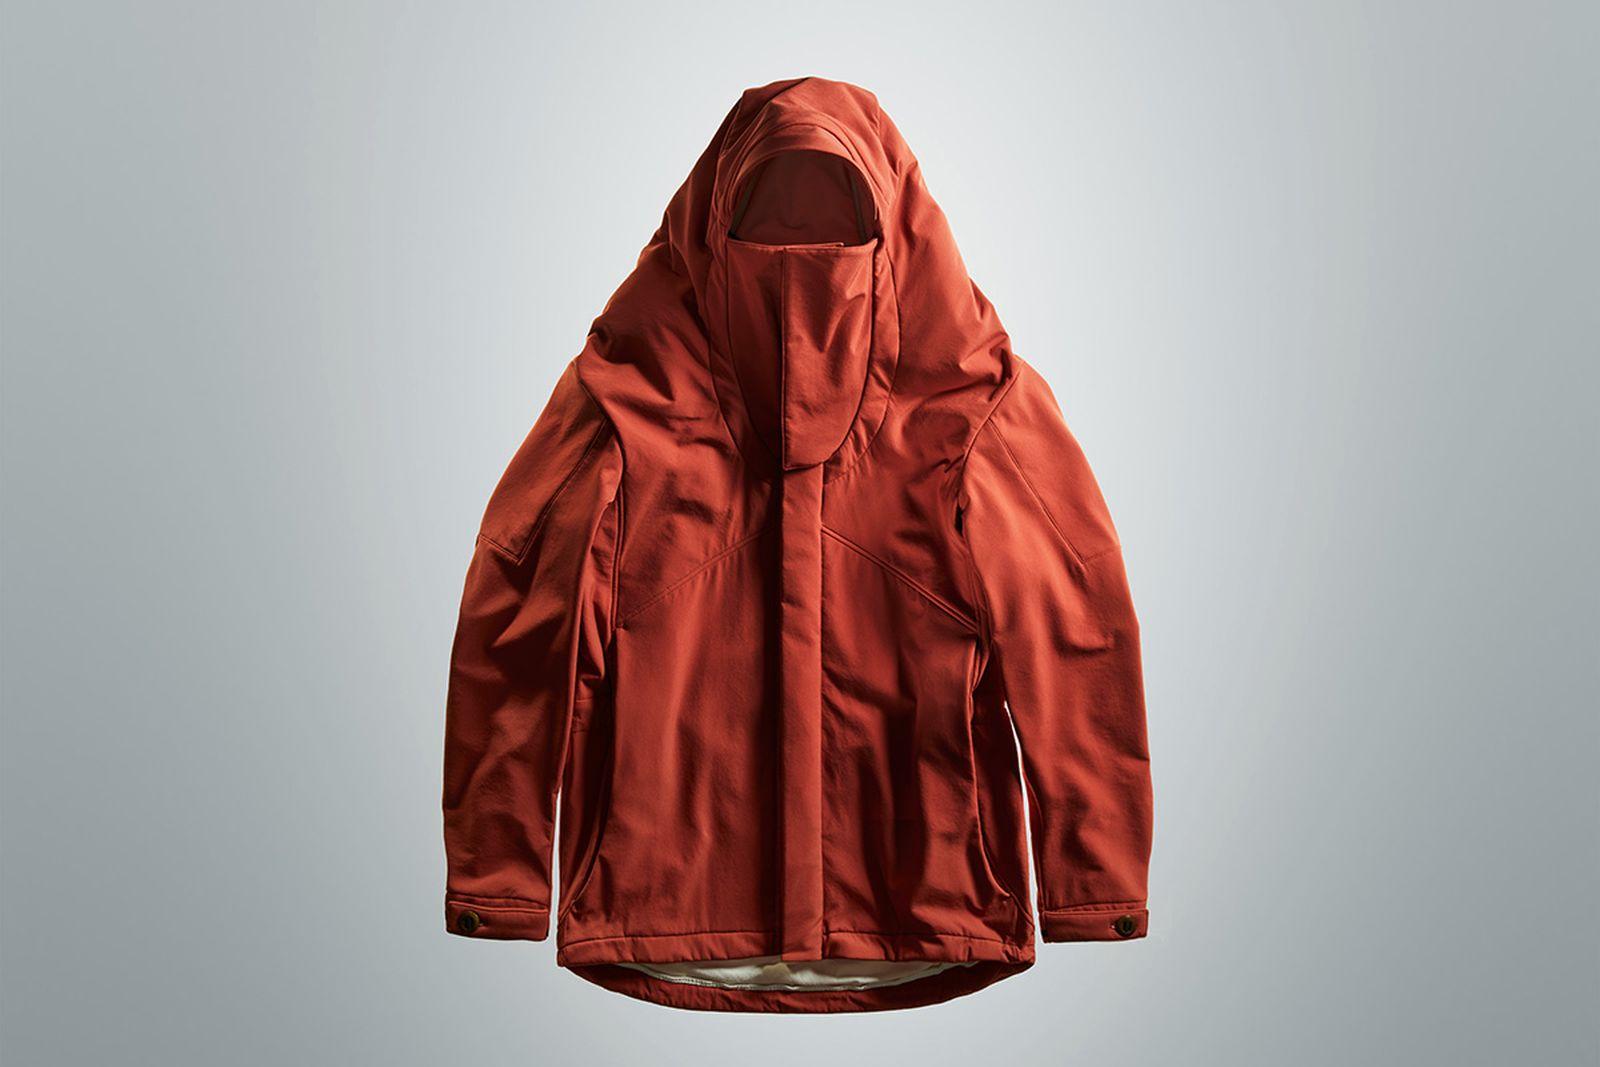 50000bc jacket future tech designed cavemen Vollebak outerwear techwear